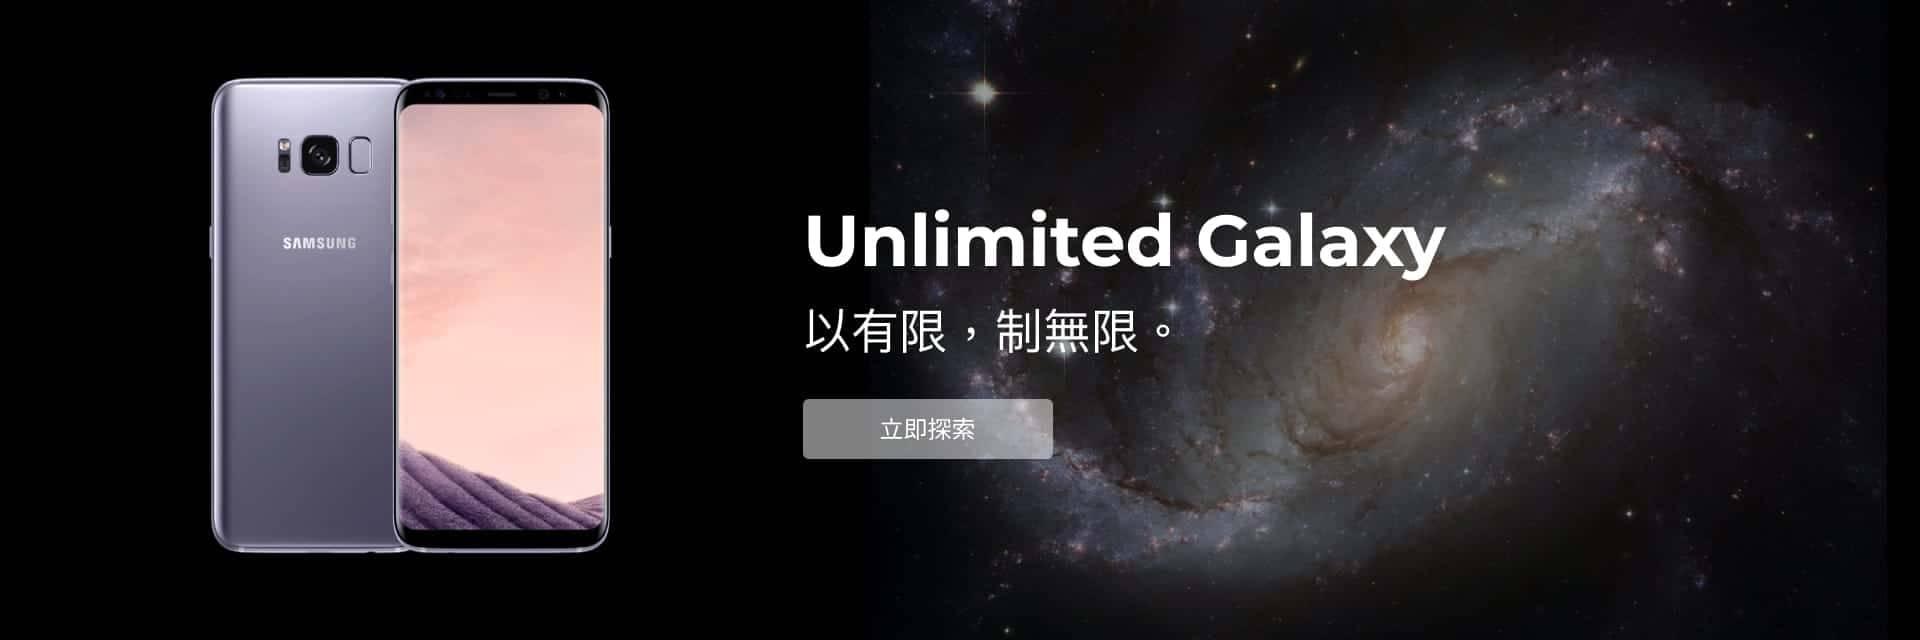 Ola Tech 三星 Galaxy 手機 以有限 制無限